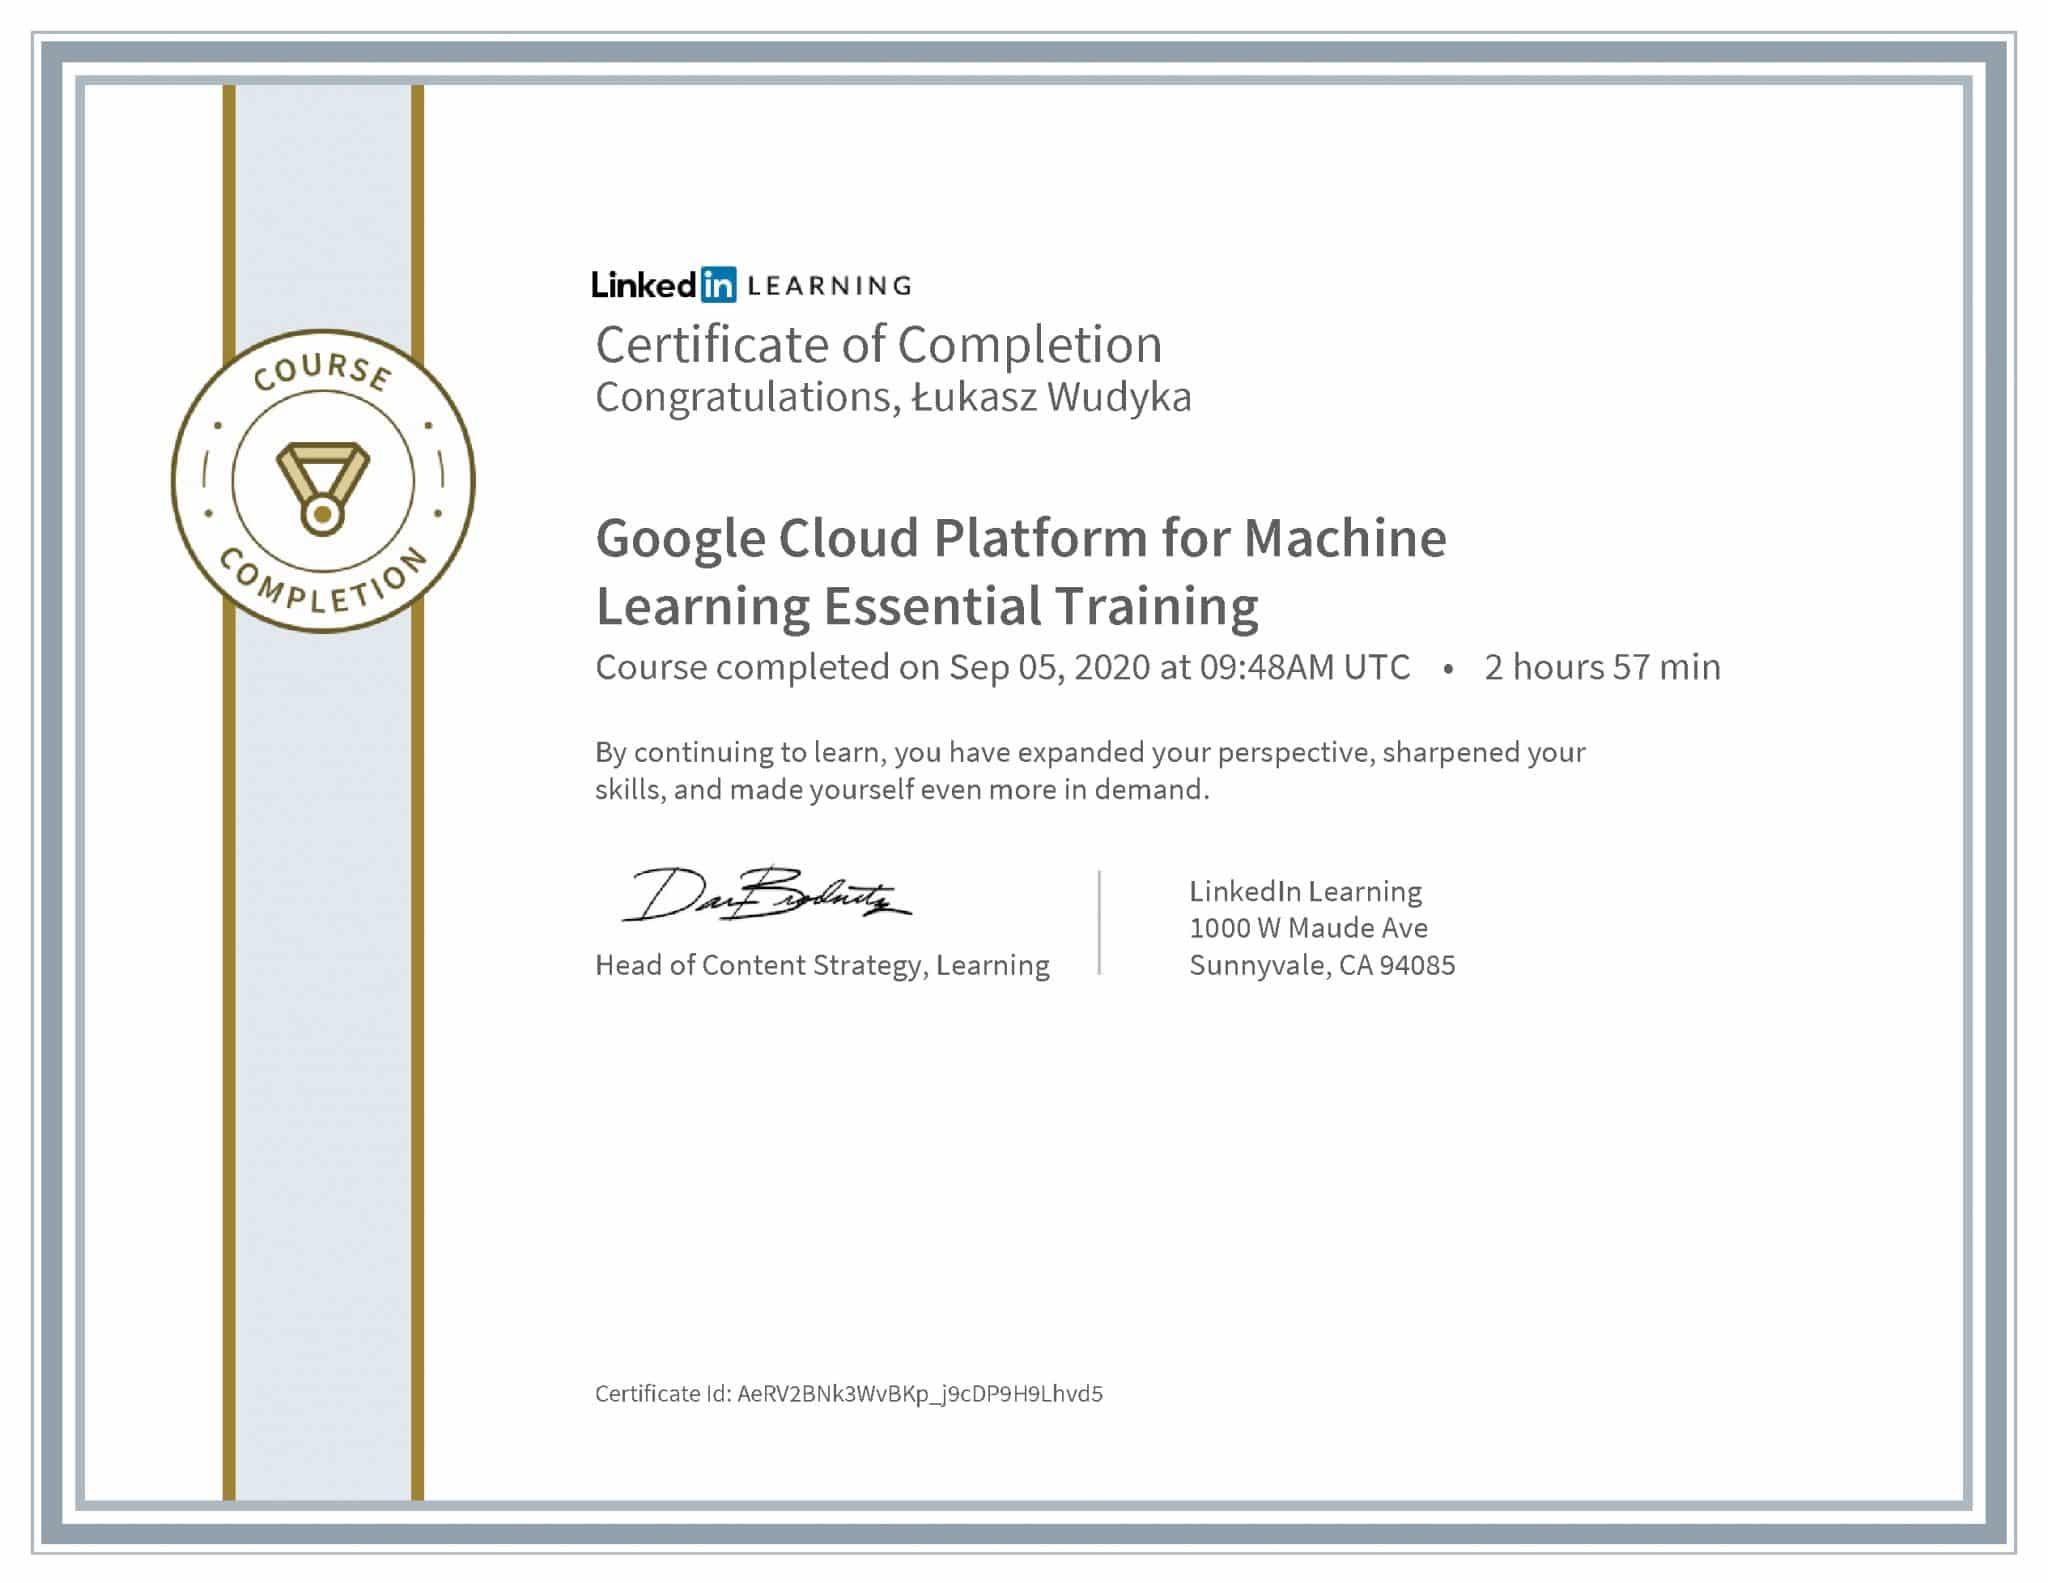 Łukasz Wudyka certyfikat LinkedIn Google Cloud Platform for Machine Learning Essential Training